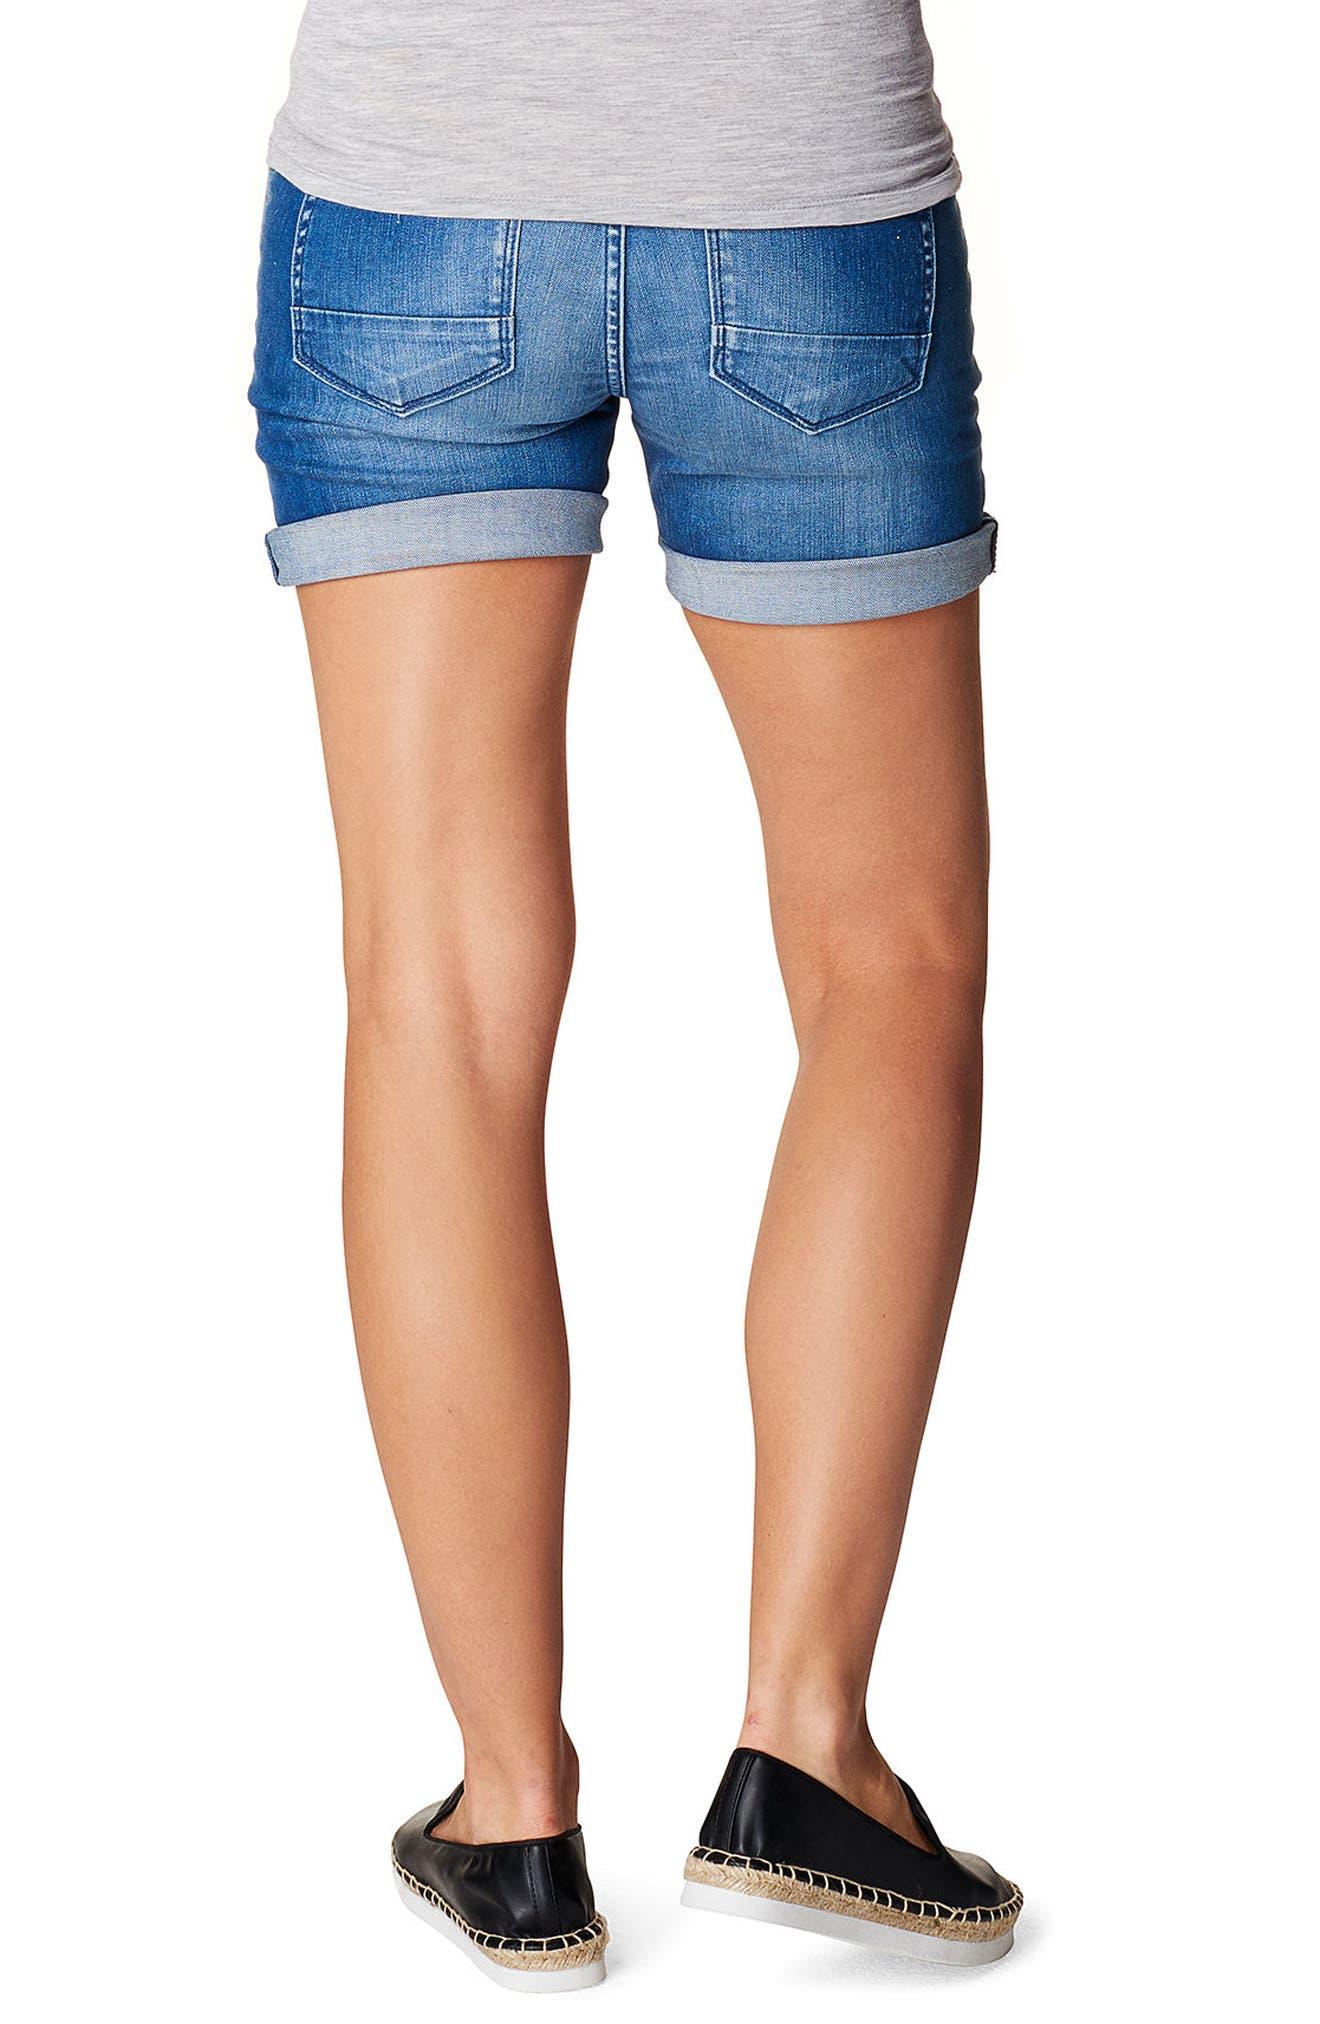 Zita Maternity Jean Shorts,                             Alternate thumbnail 2, color,                             MID BLUE